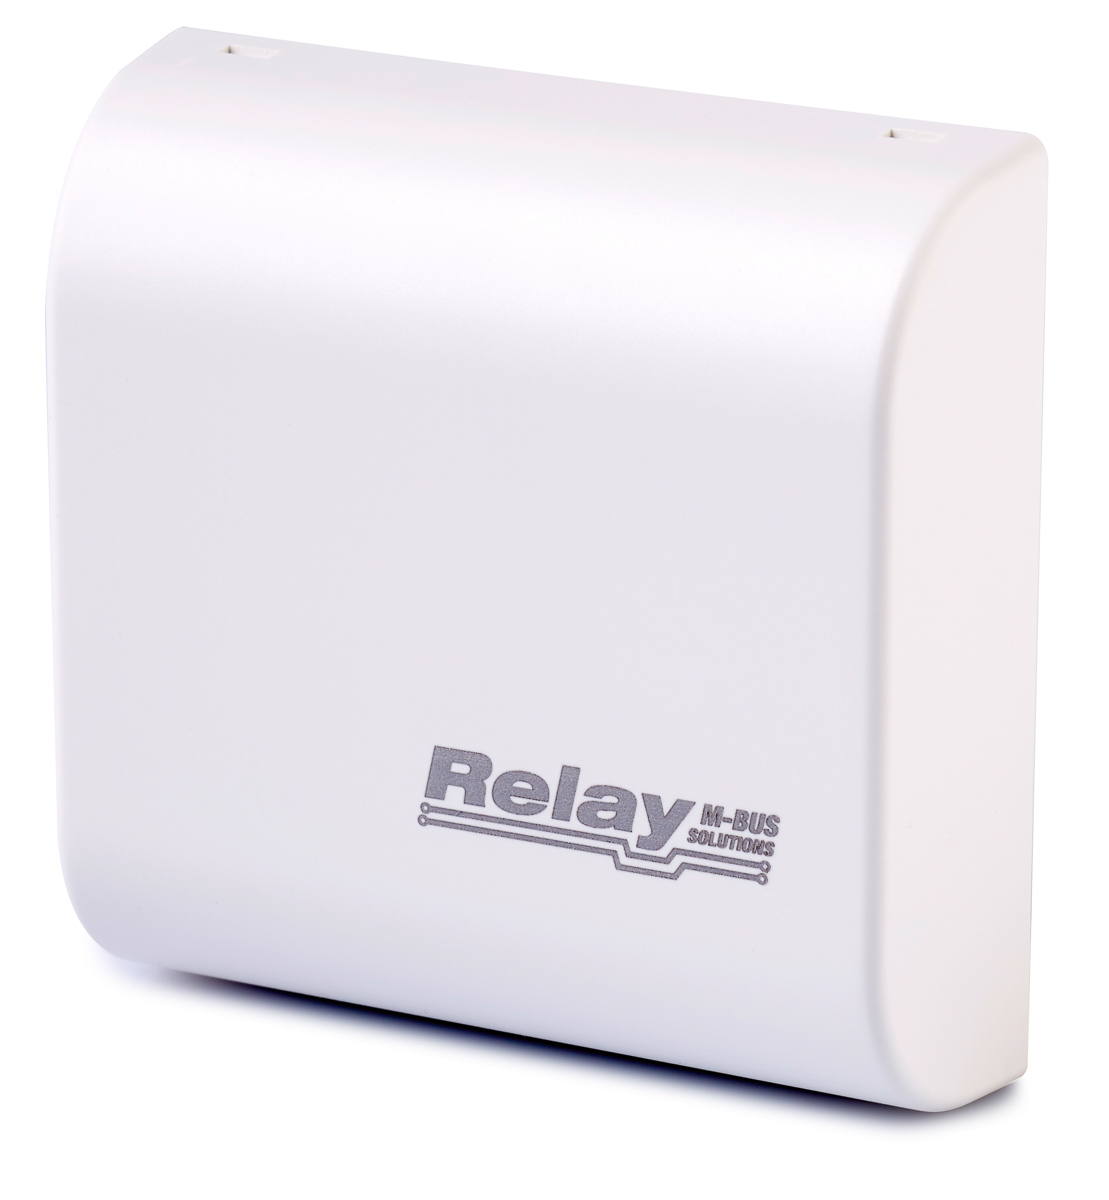 RelAir R2M - Relay GmbH